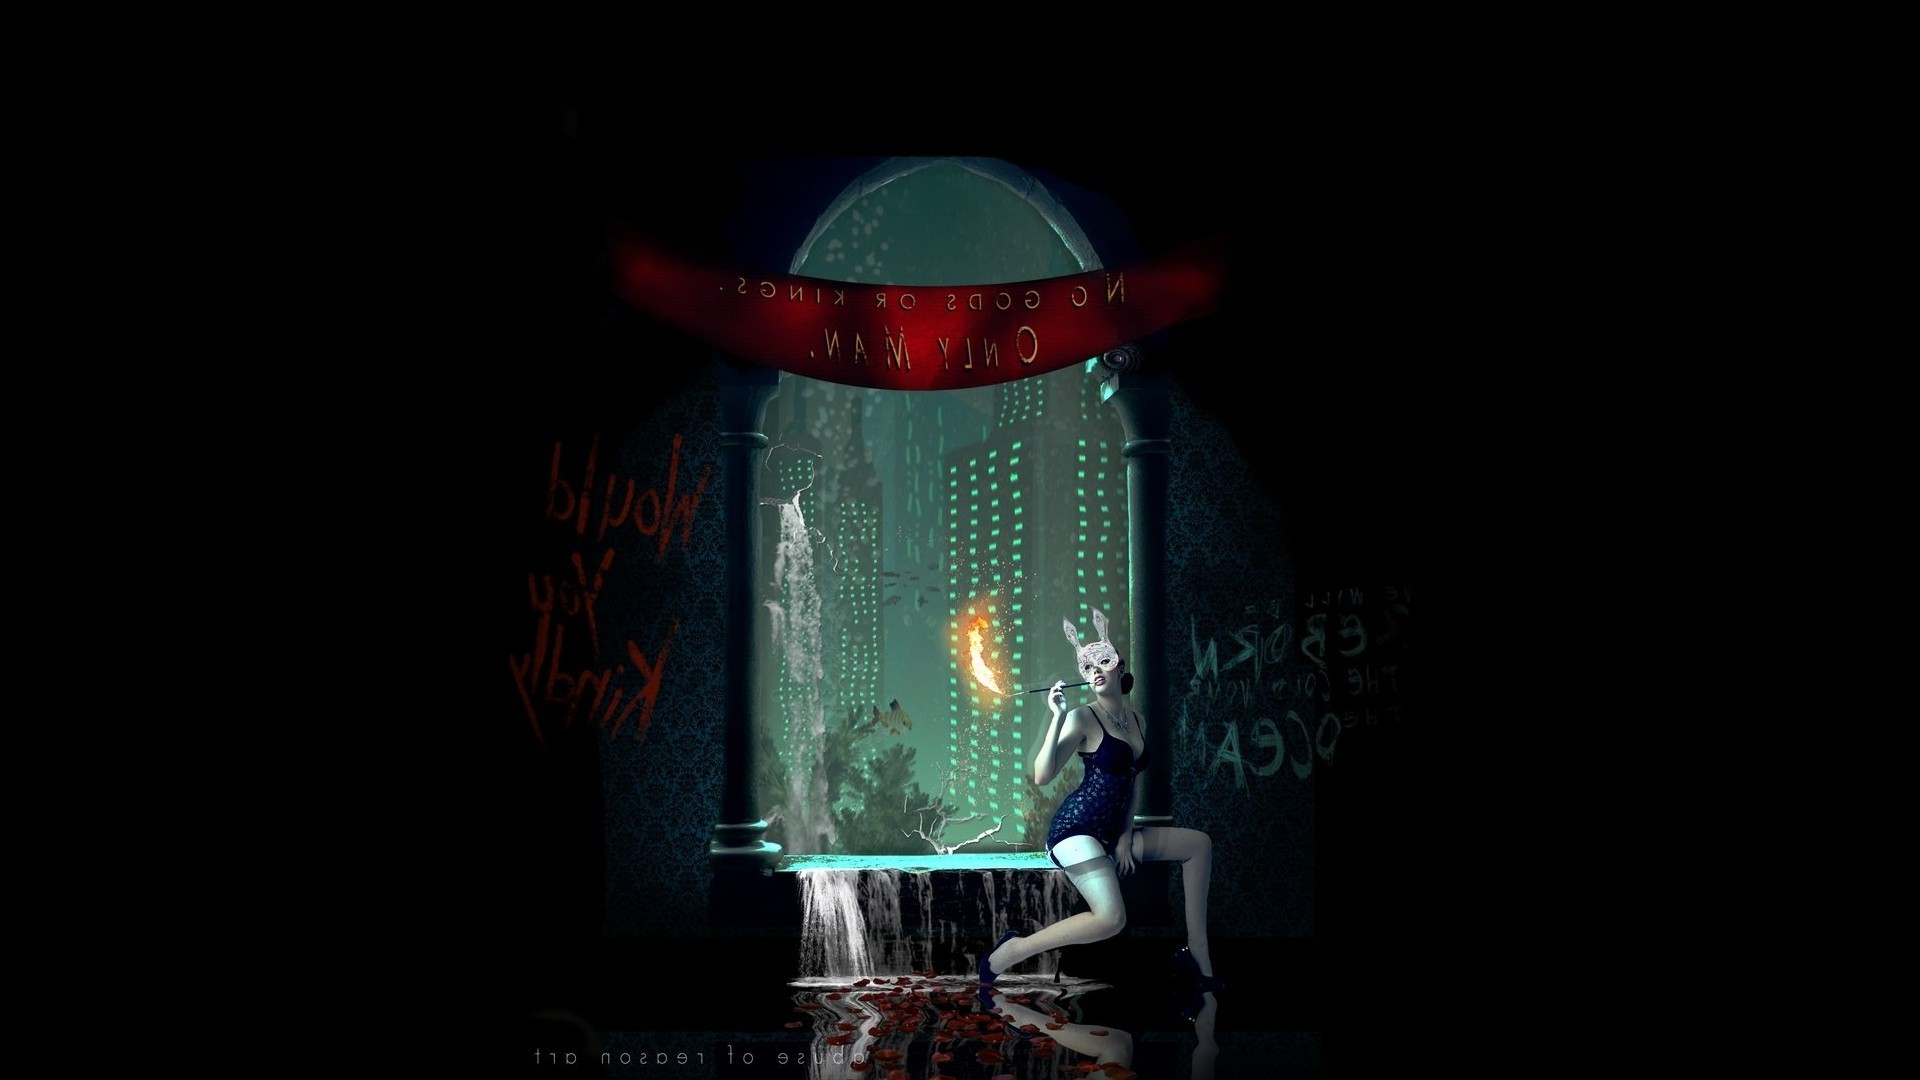 Bioshock Rapture Lighthouse Wallpaper WallDevil